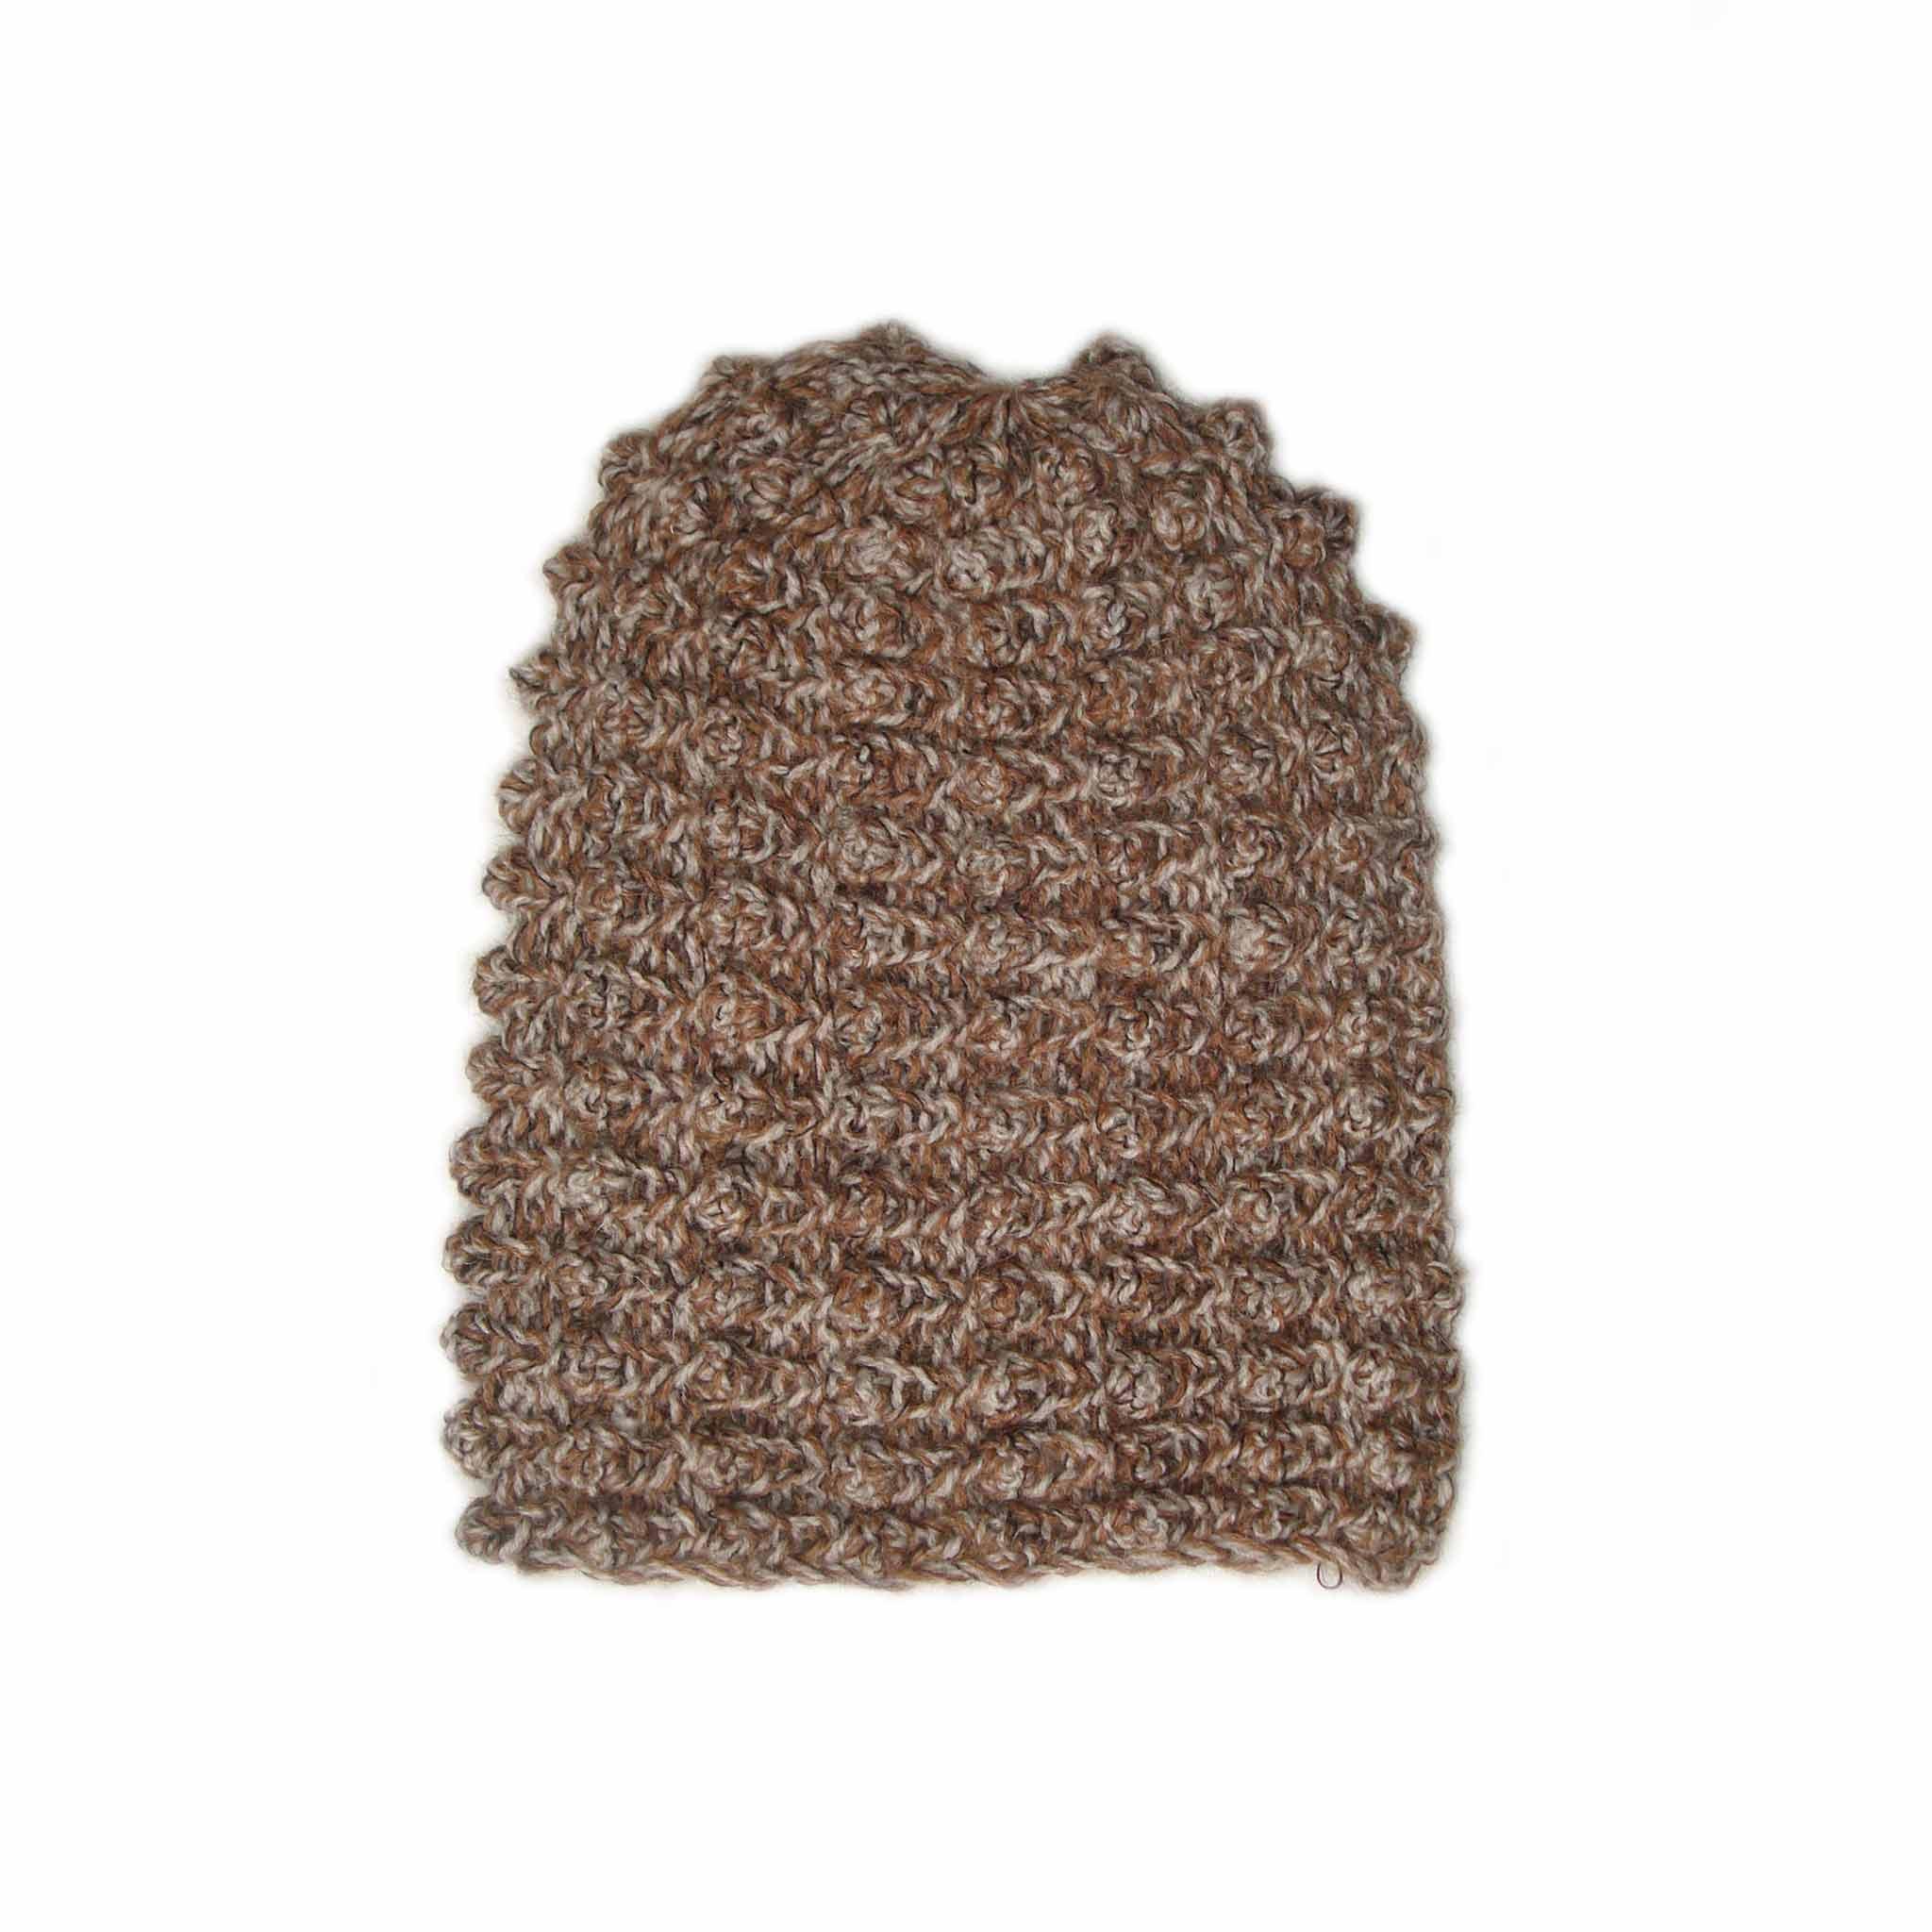 POPSFL wholesale producer, PFL knitwear, beanie oversized solid color with pattern, alpaca or alpaca blend